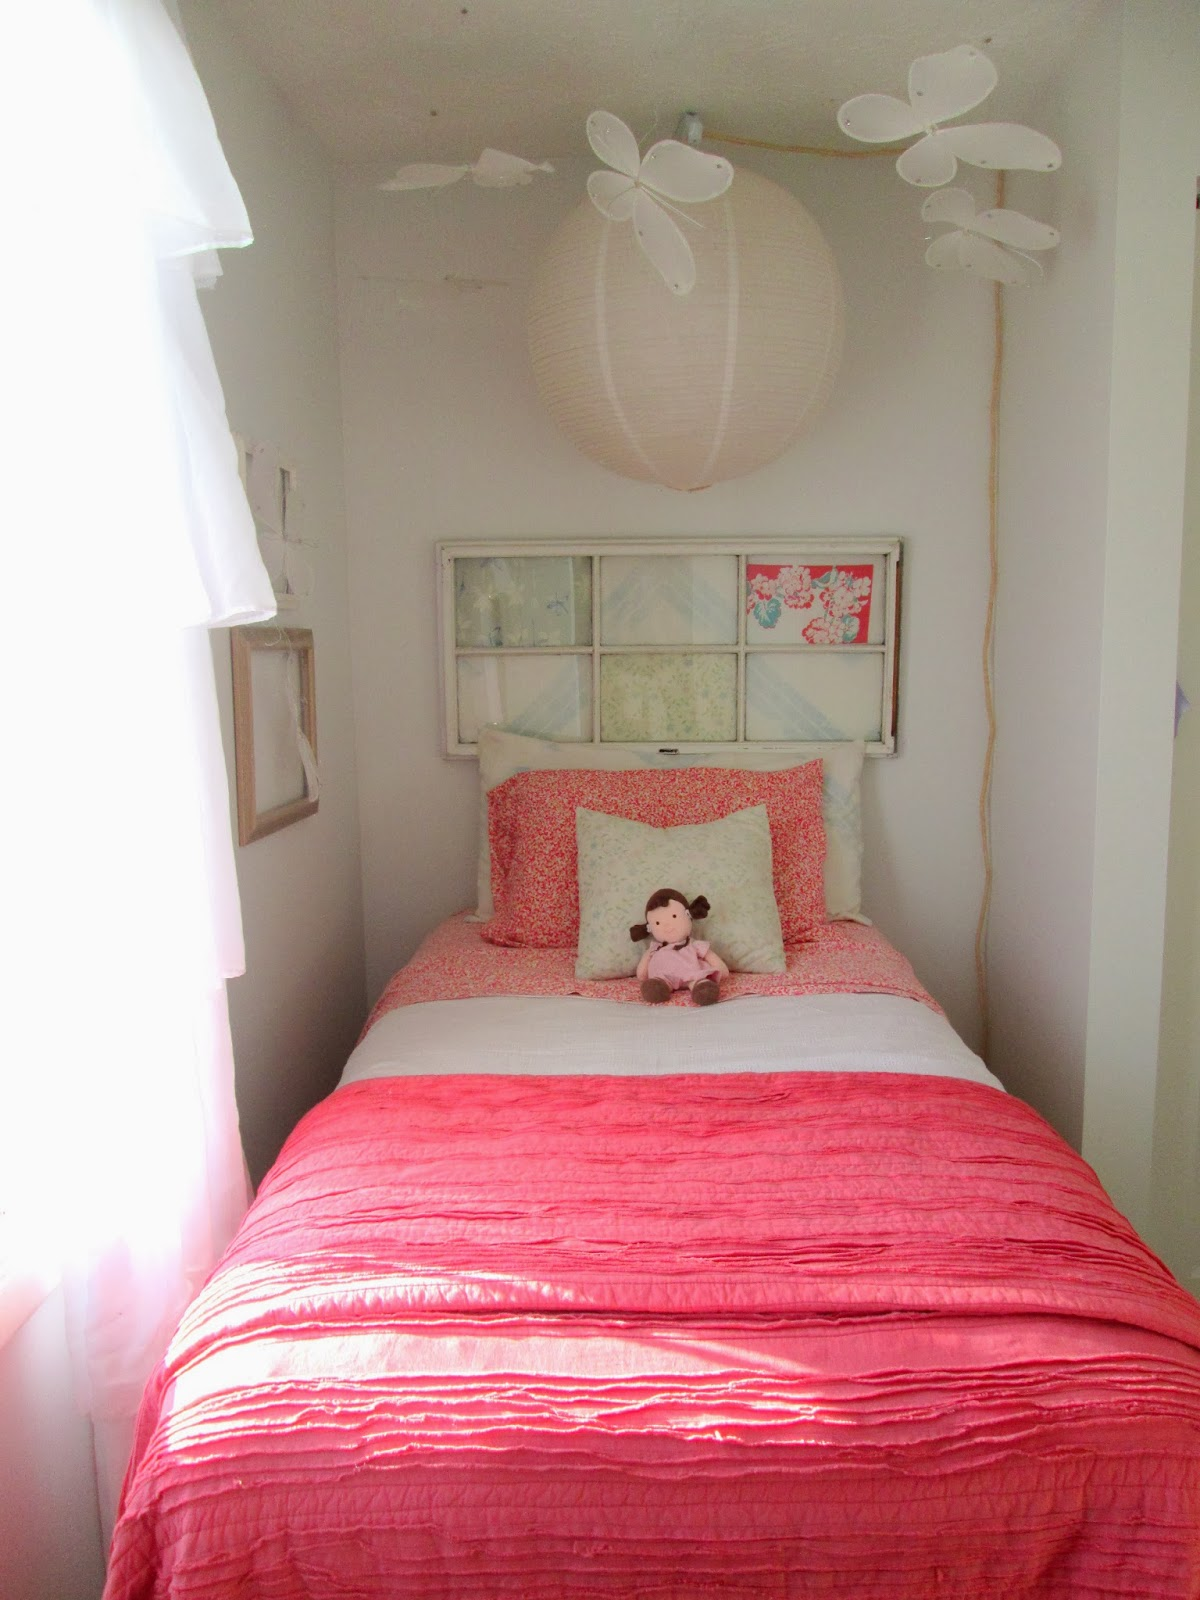 shire+room+redo2.jpg